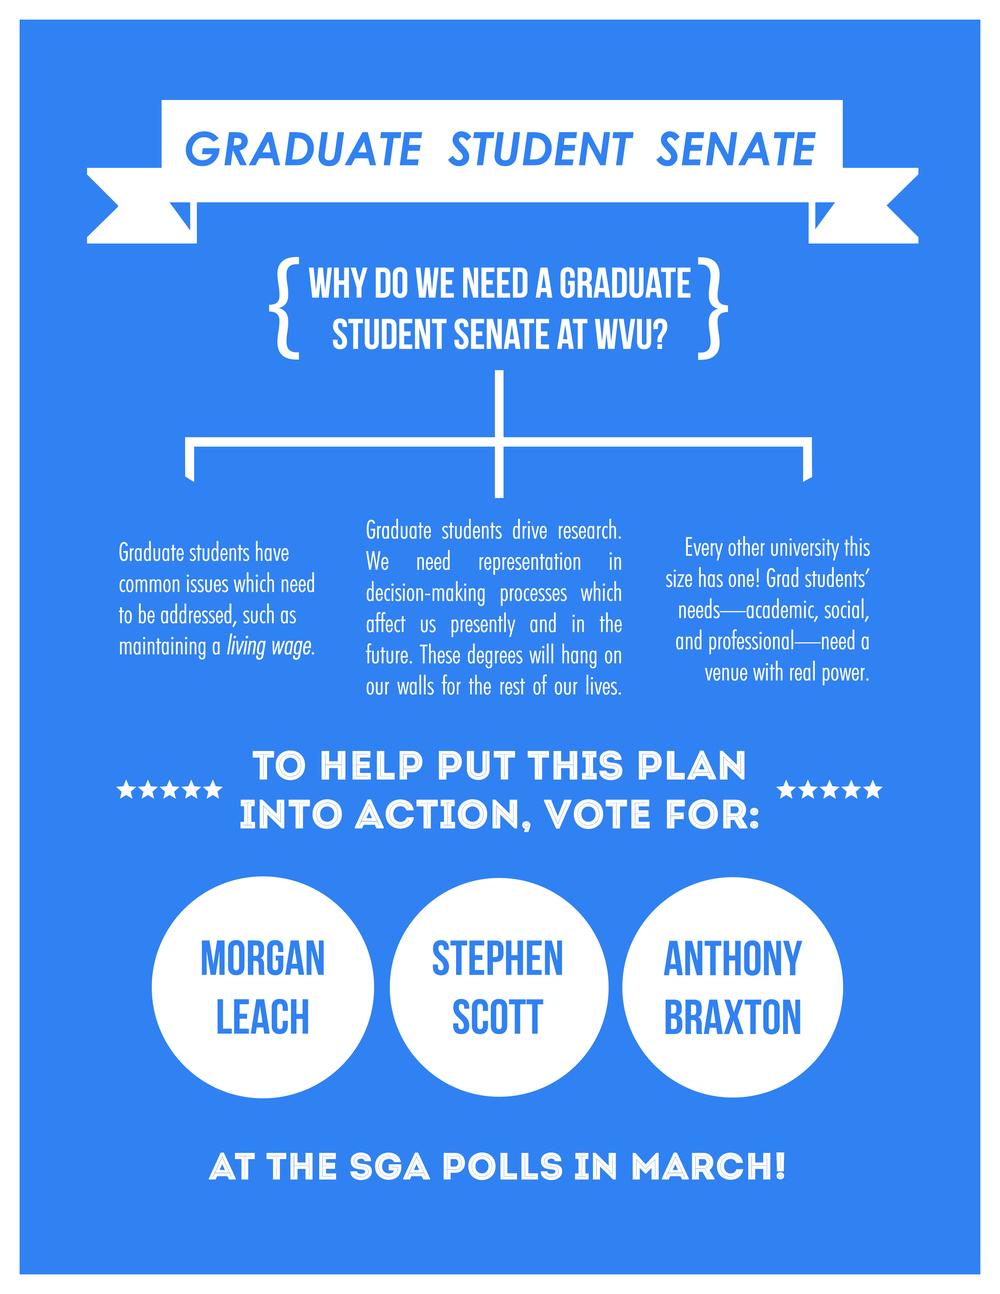 WVU_Graduate_Senate_Flyer_Color_Names.jpg